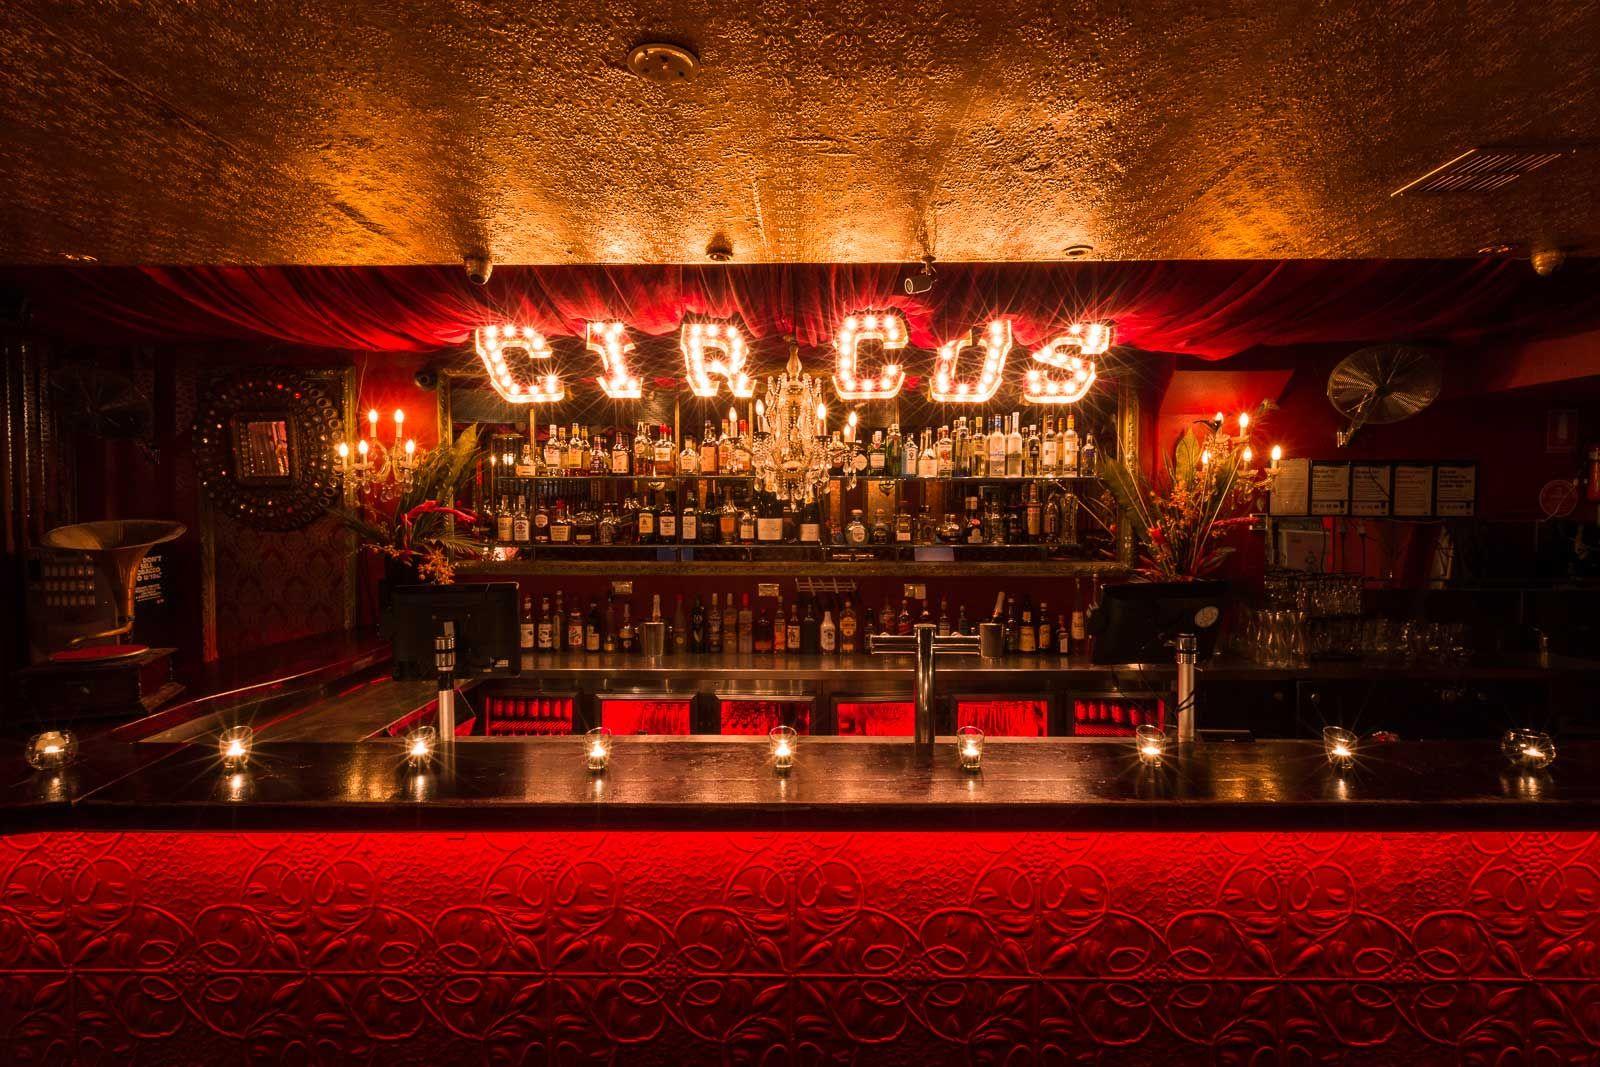 Venue Gallery Circus Bar Nightclub South Yarra Melbourne Night Club Circus Discotheque